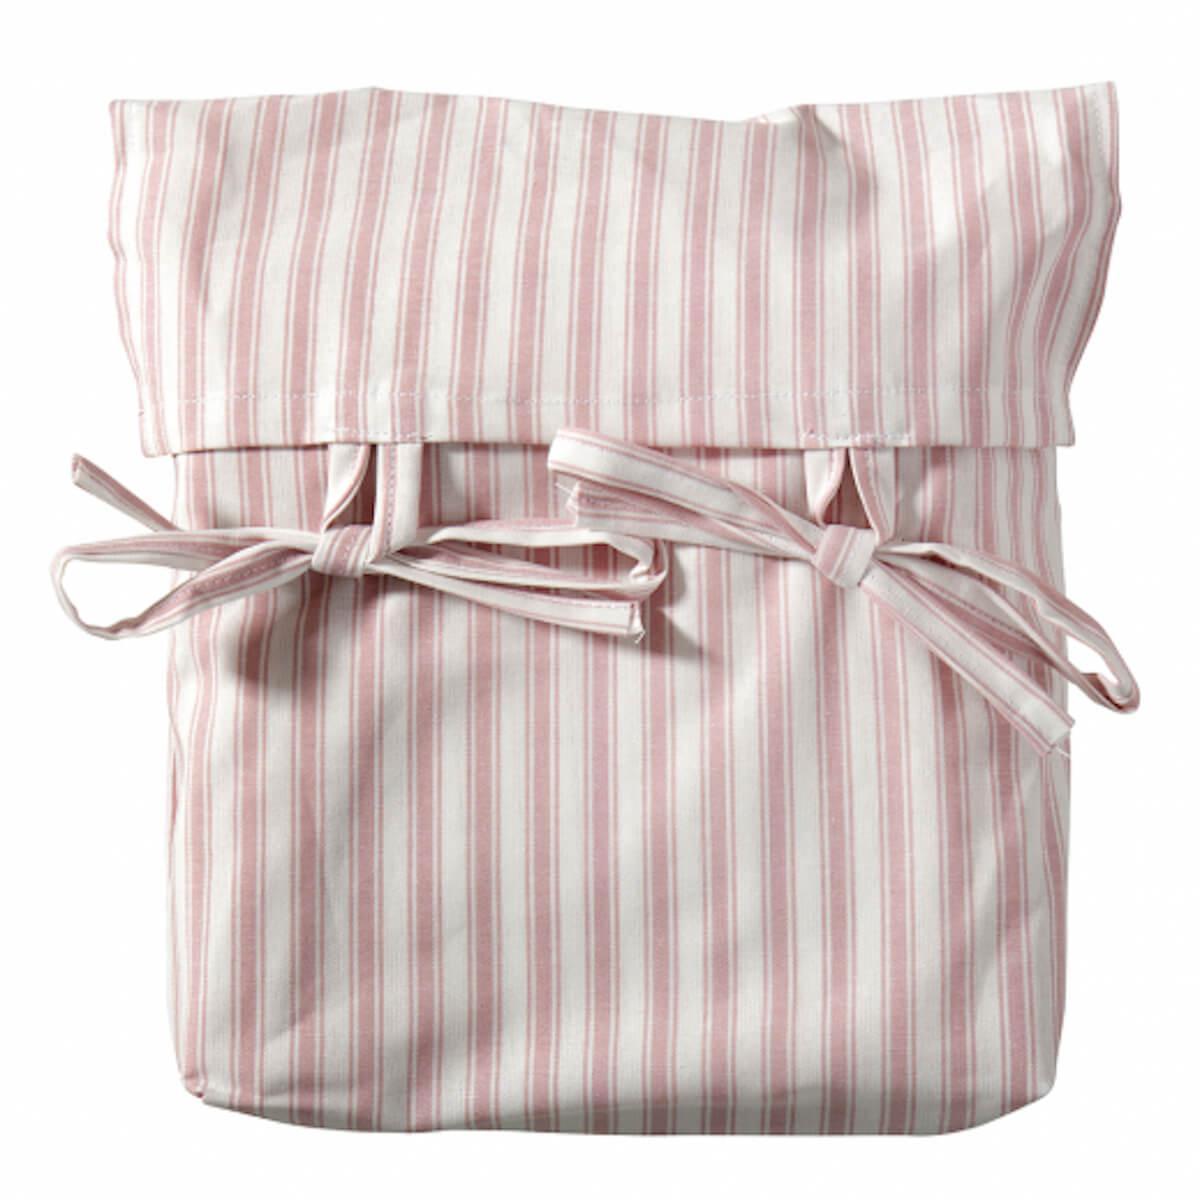 Cortinas cama alta/semi-alta SEASIDE CLASSIC Oliver Furniture rayas rosas